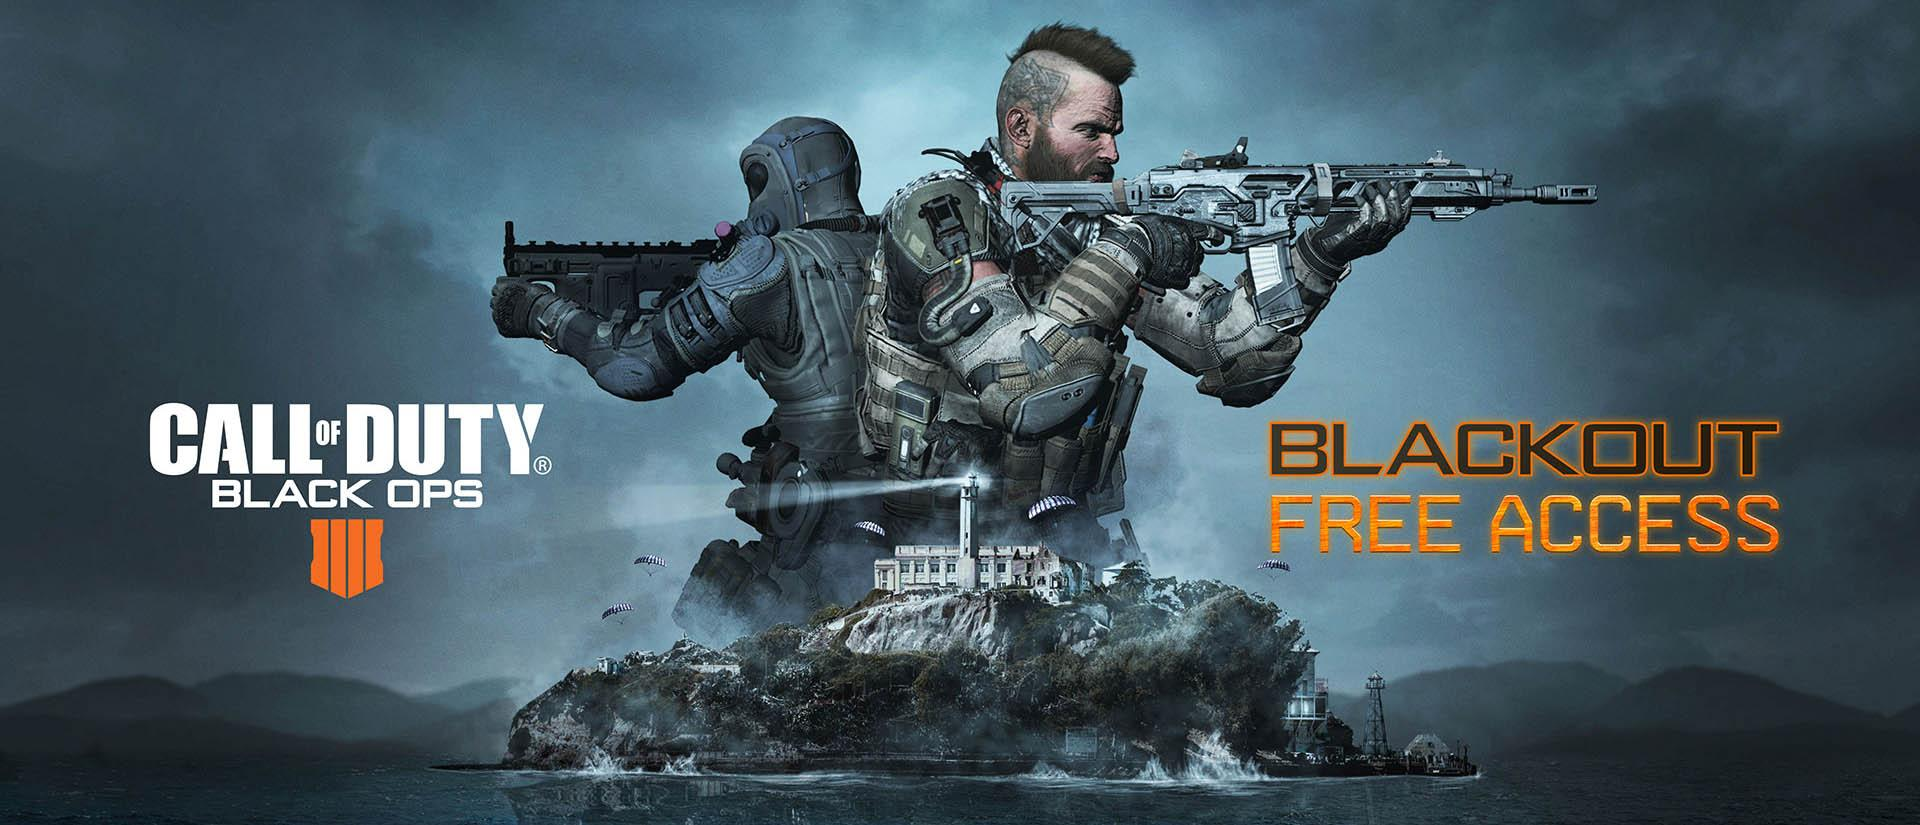 Call of Duty: Black Ops 4: Blackout Modus und neue Alcatraz Map sind einen Monat lang gratis spielbar